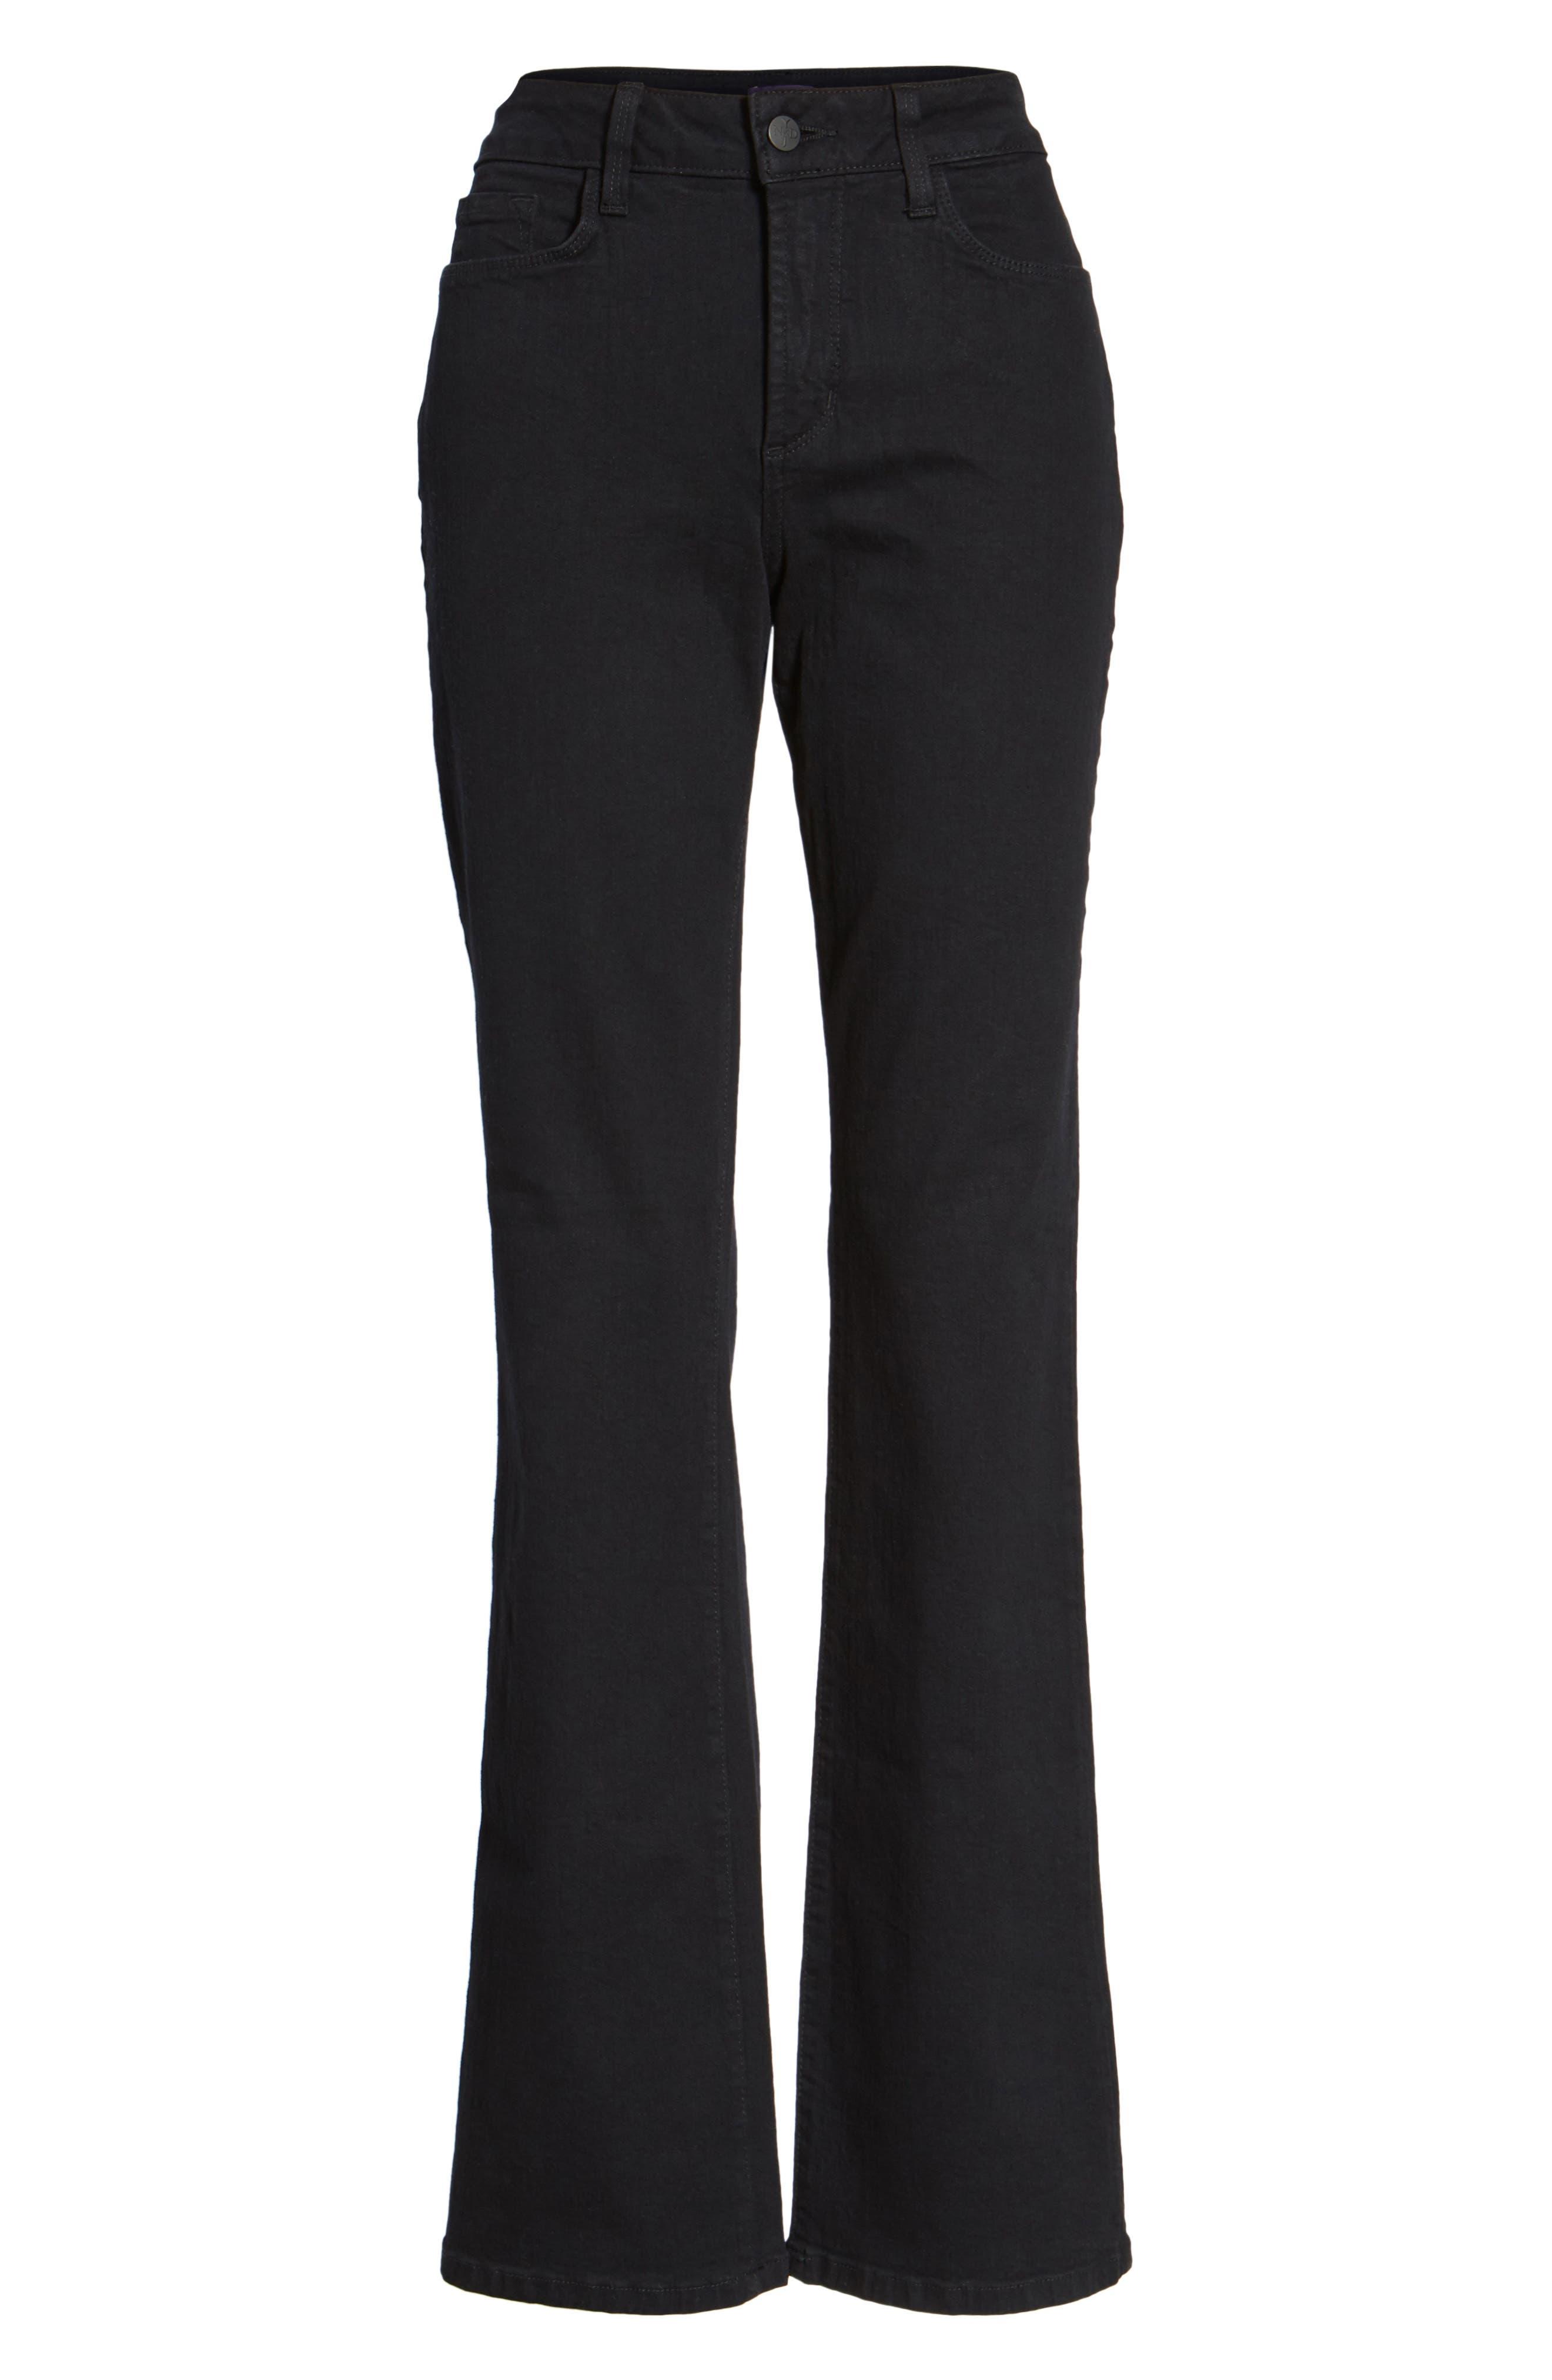 Barbara Stretch Bootcut Jeans,                             Alternate thumbnail 7, color,                             Black